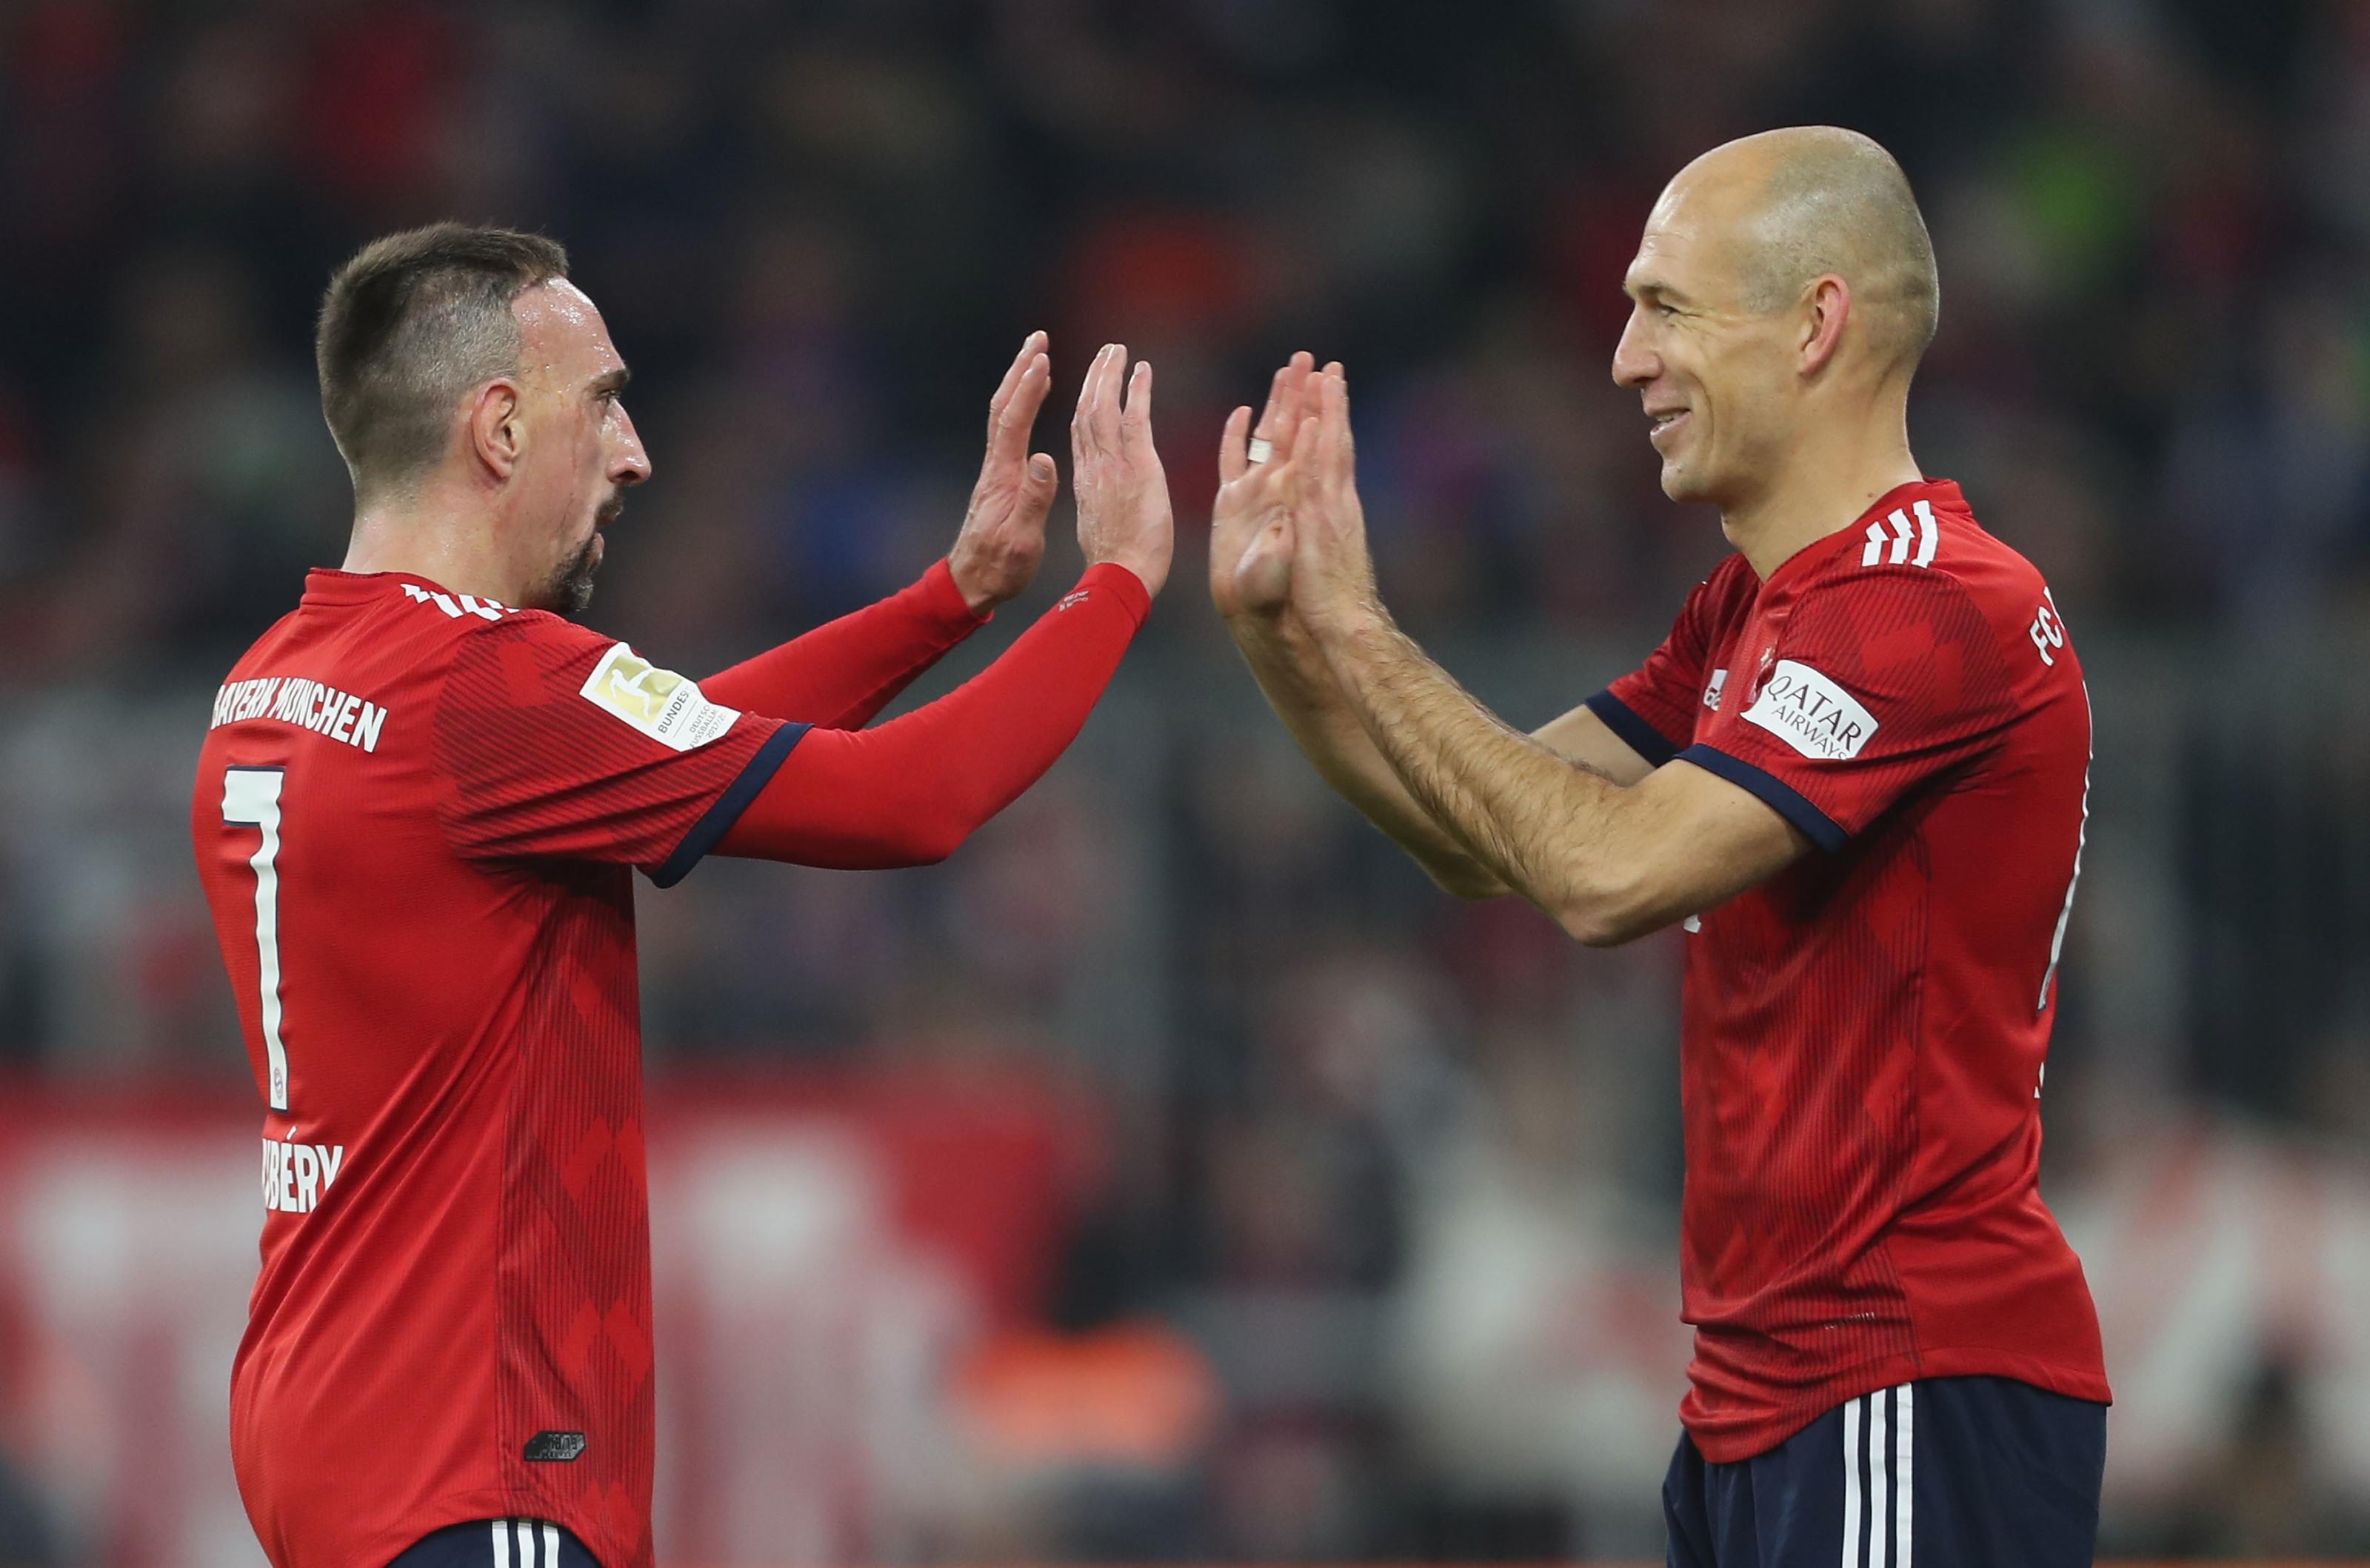 Bayern Munich: Franck Ribery comments on Arjen Robben departure